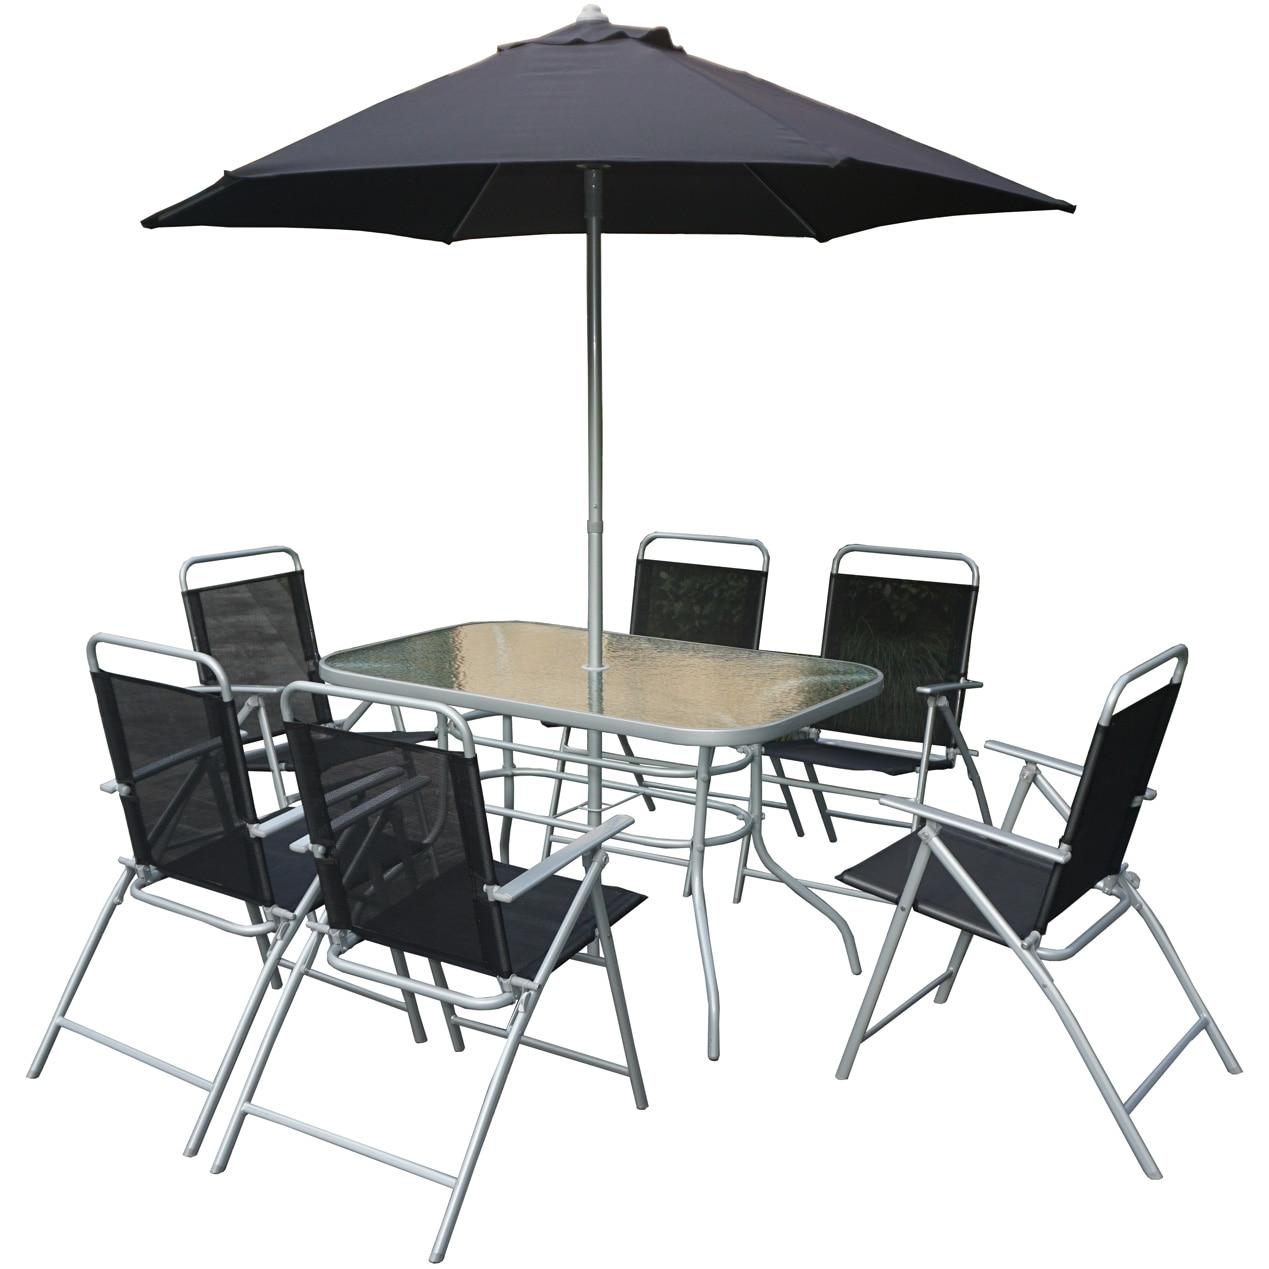 Fotografie Set mobilier gradina/terasa Kring Donso, masa, 6 scaun pliabile, umbrela, culoare antracit